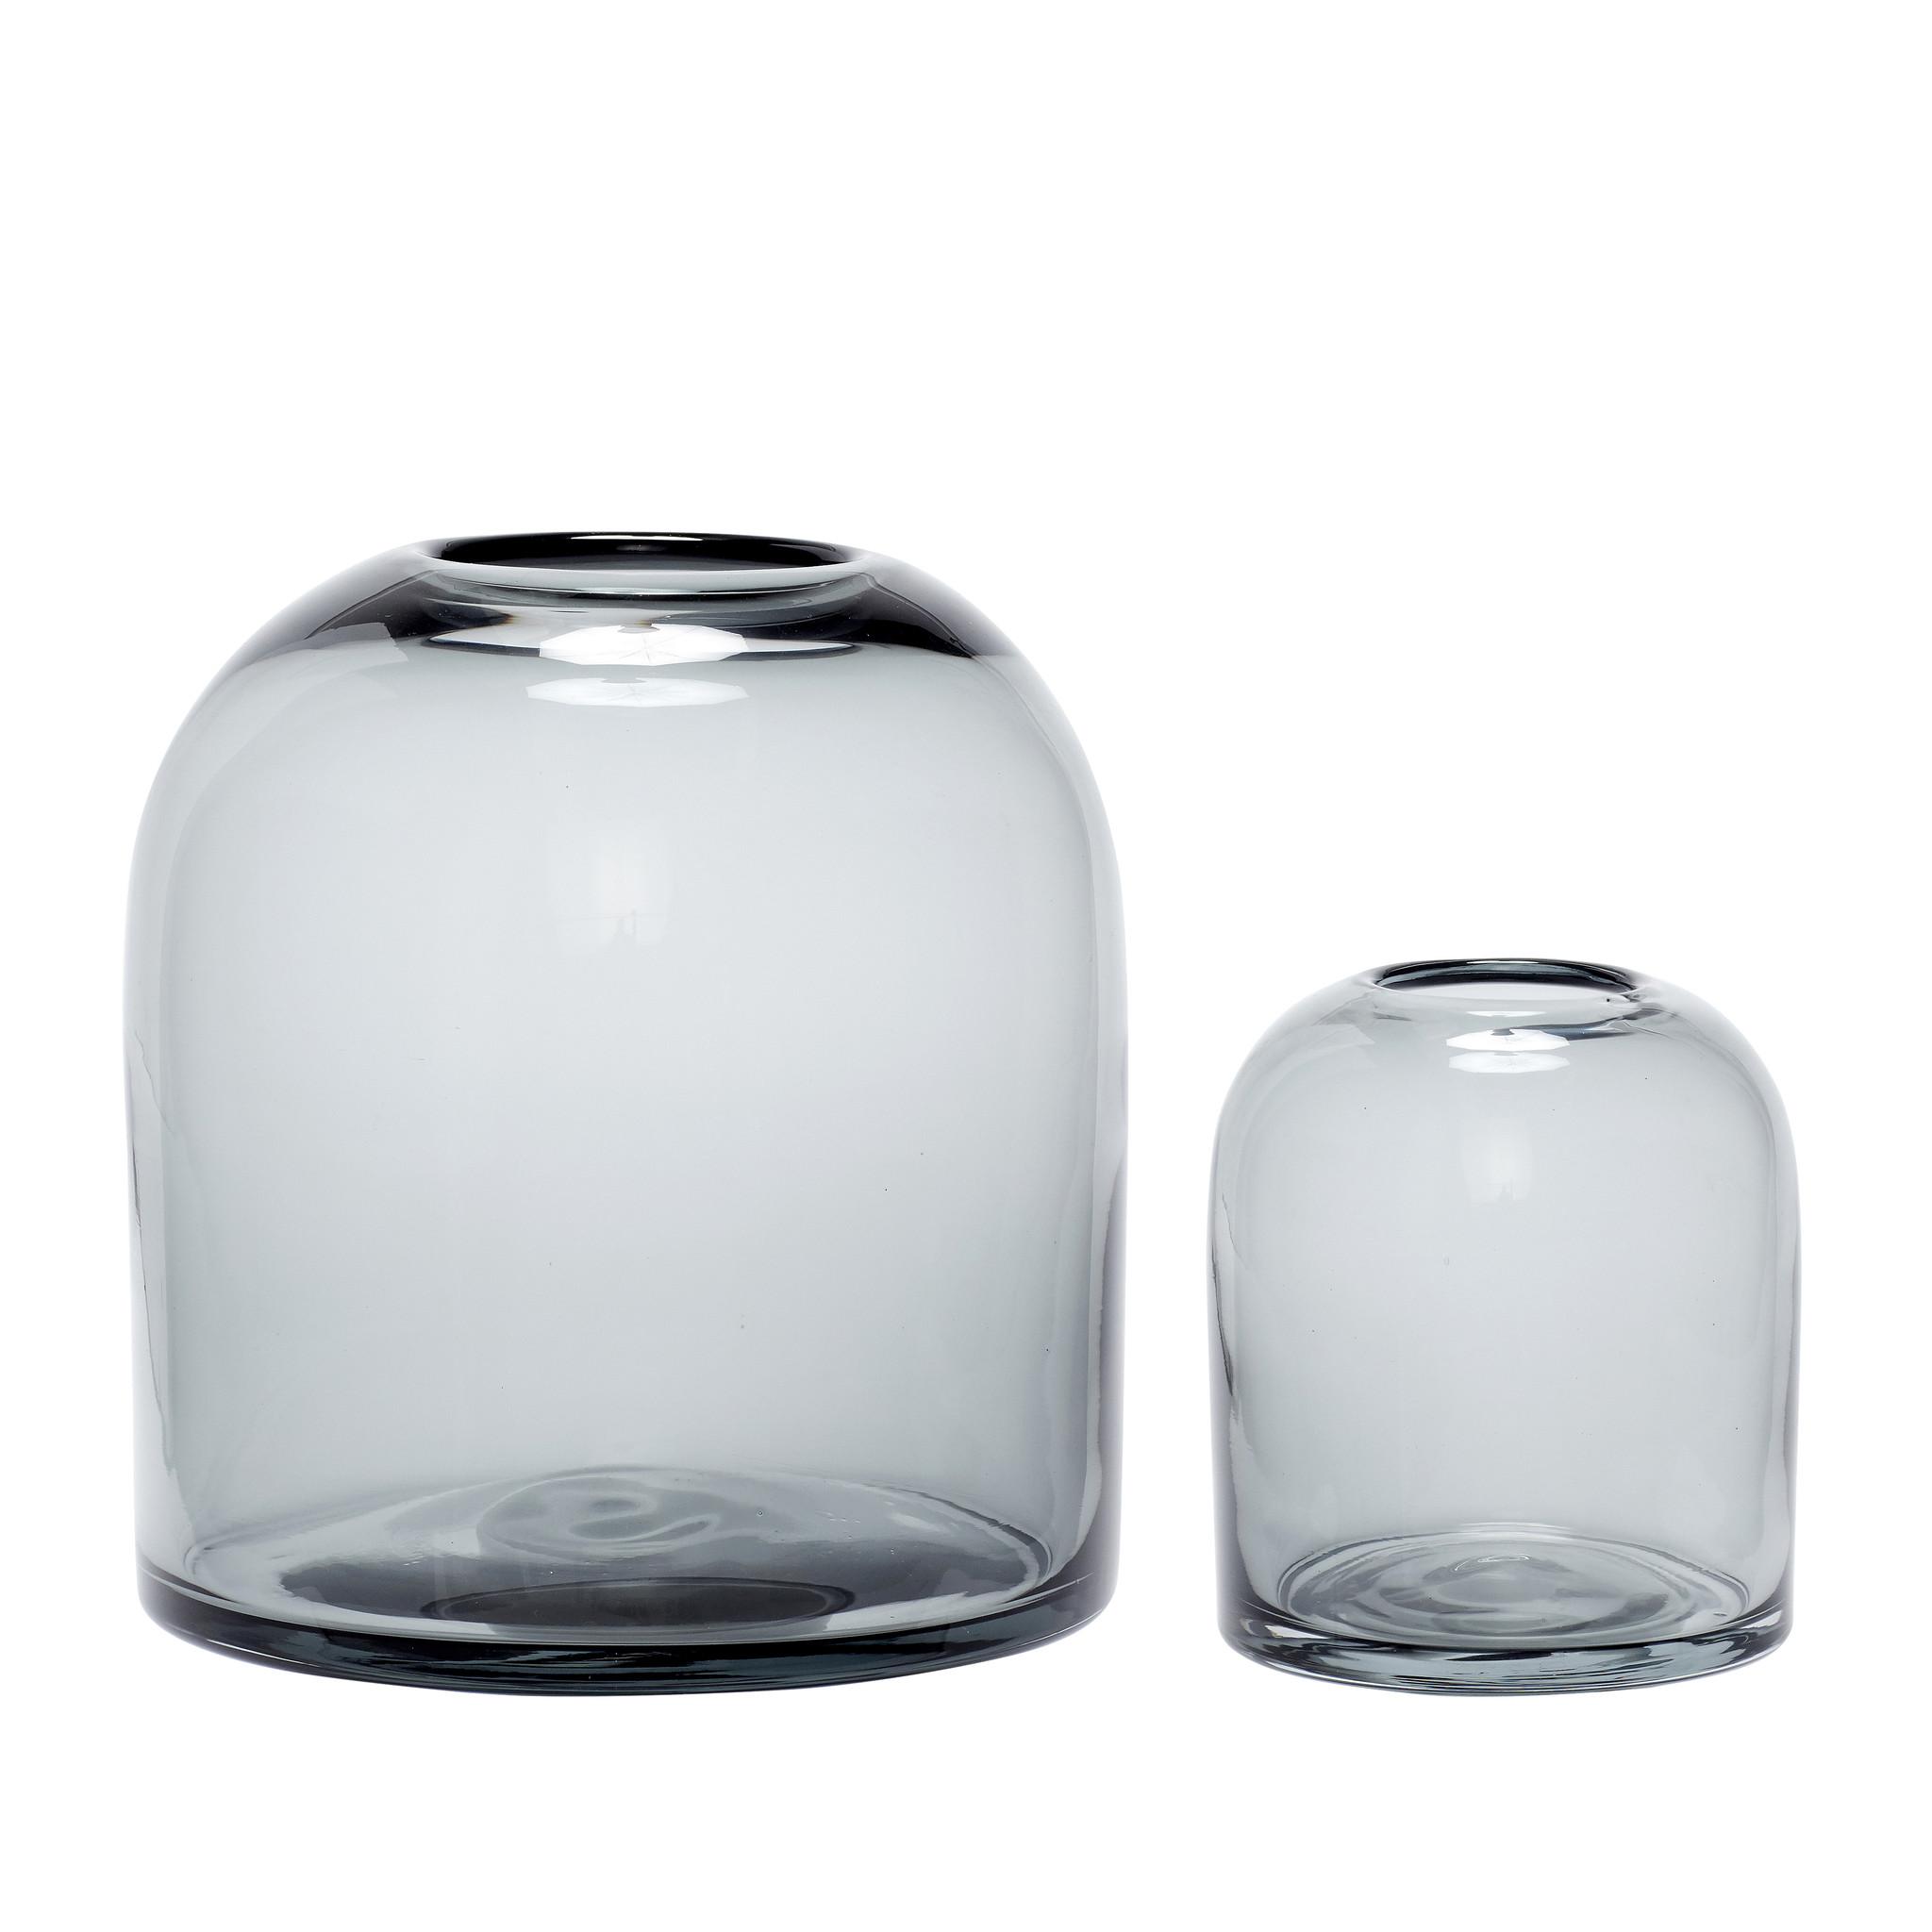 Hubsch Vaas, glas, gerookt, set van 2-280501-5712772056608